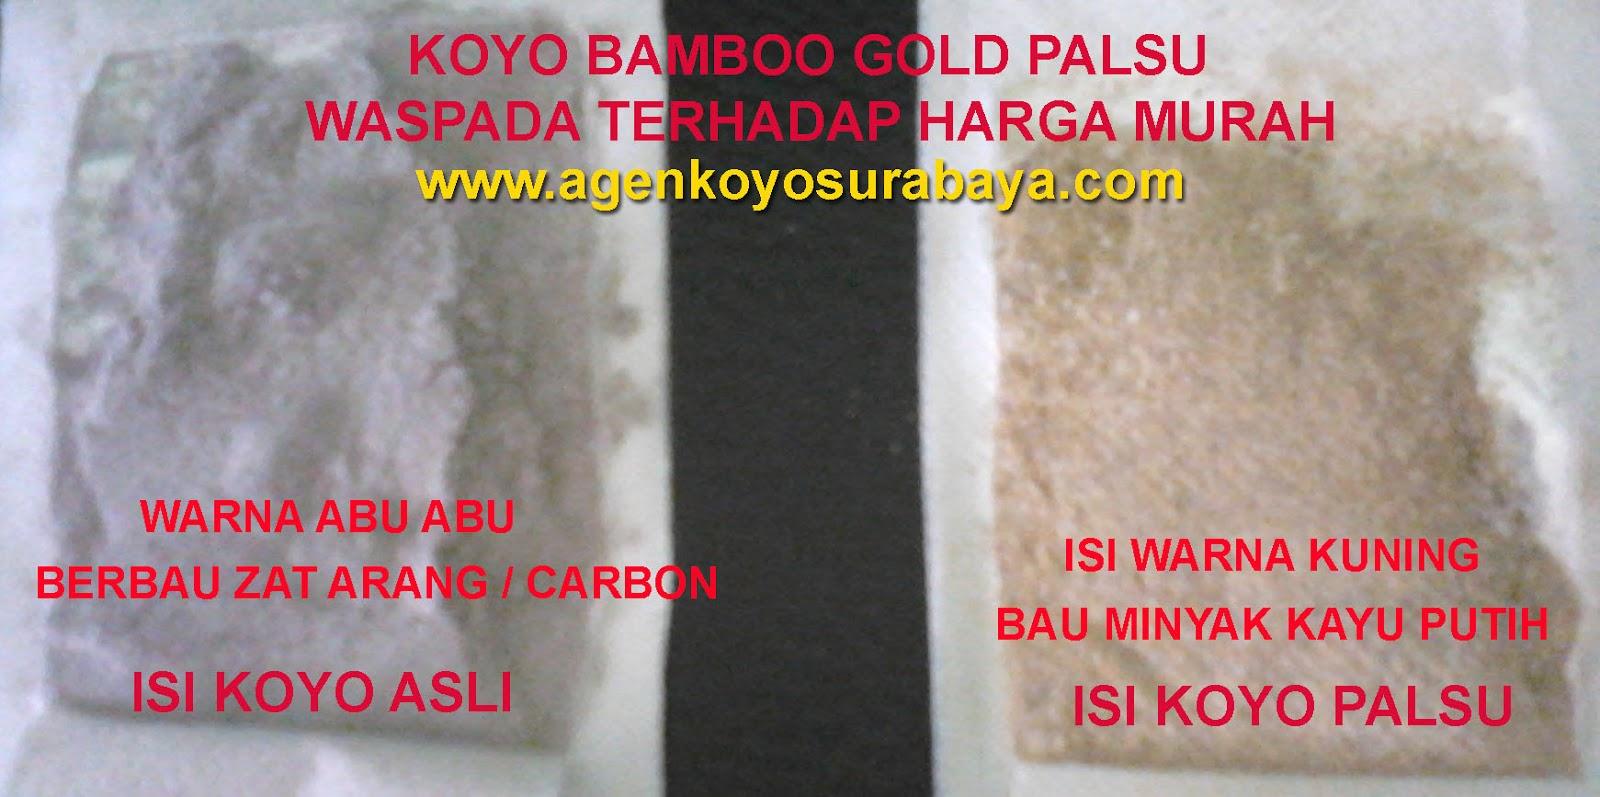 Daftar Harga Koyo Kaki Bamboo Bambu Gold Original Terbaru 2018 Bambo Detox Kesehatan Agen Surabaya Happy Life Jual Ciri Yang Tidak Ori Kw